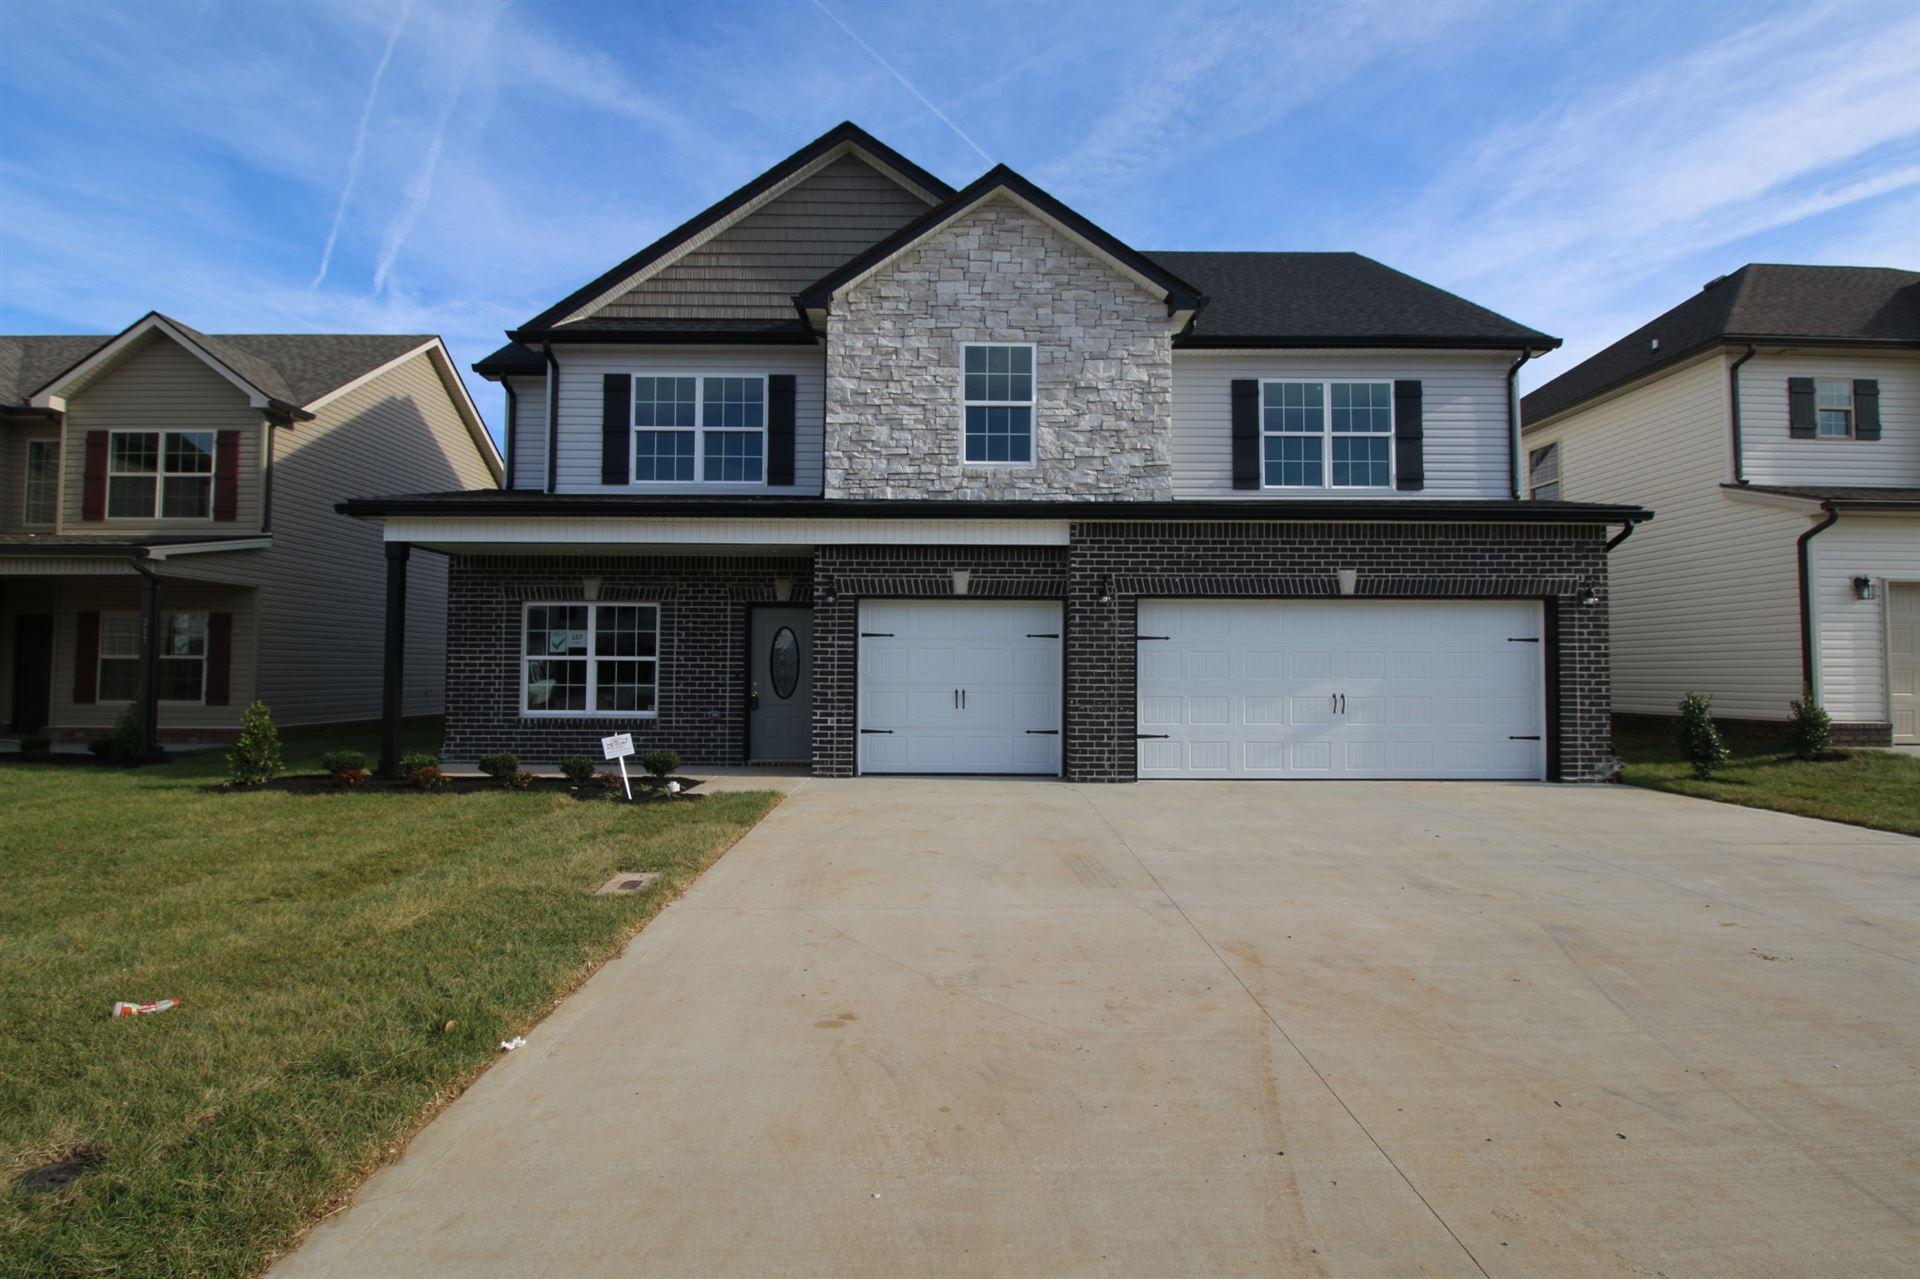 157 Mills Creek, Clarksville, TN 37042 - MLS#: 2291616